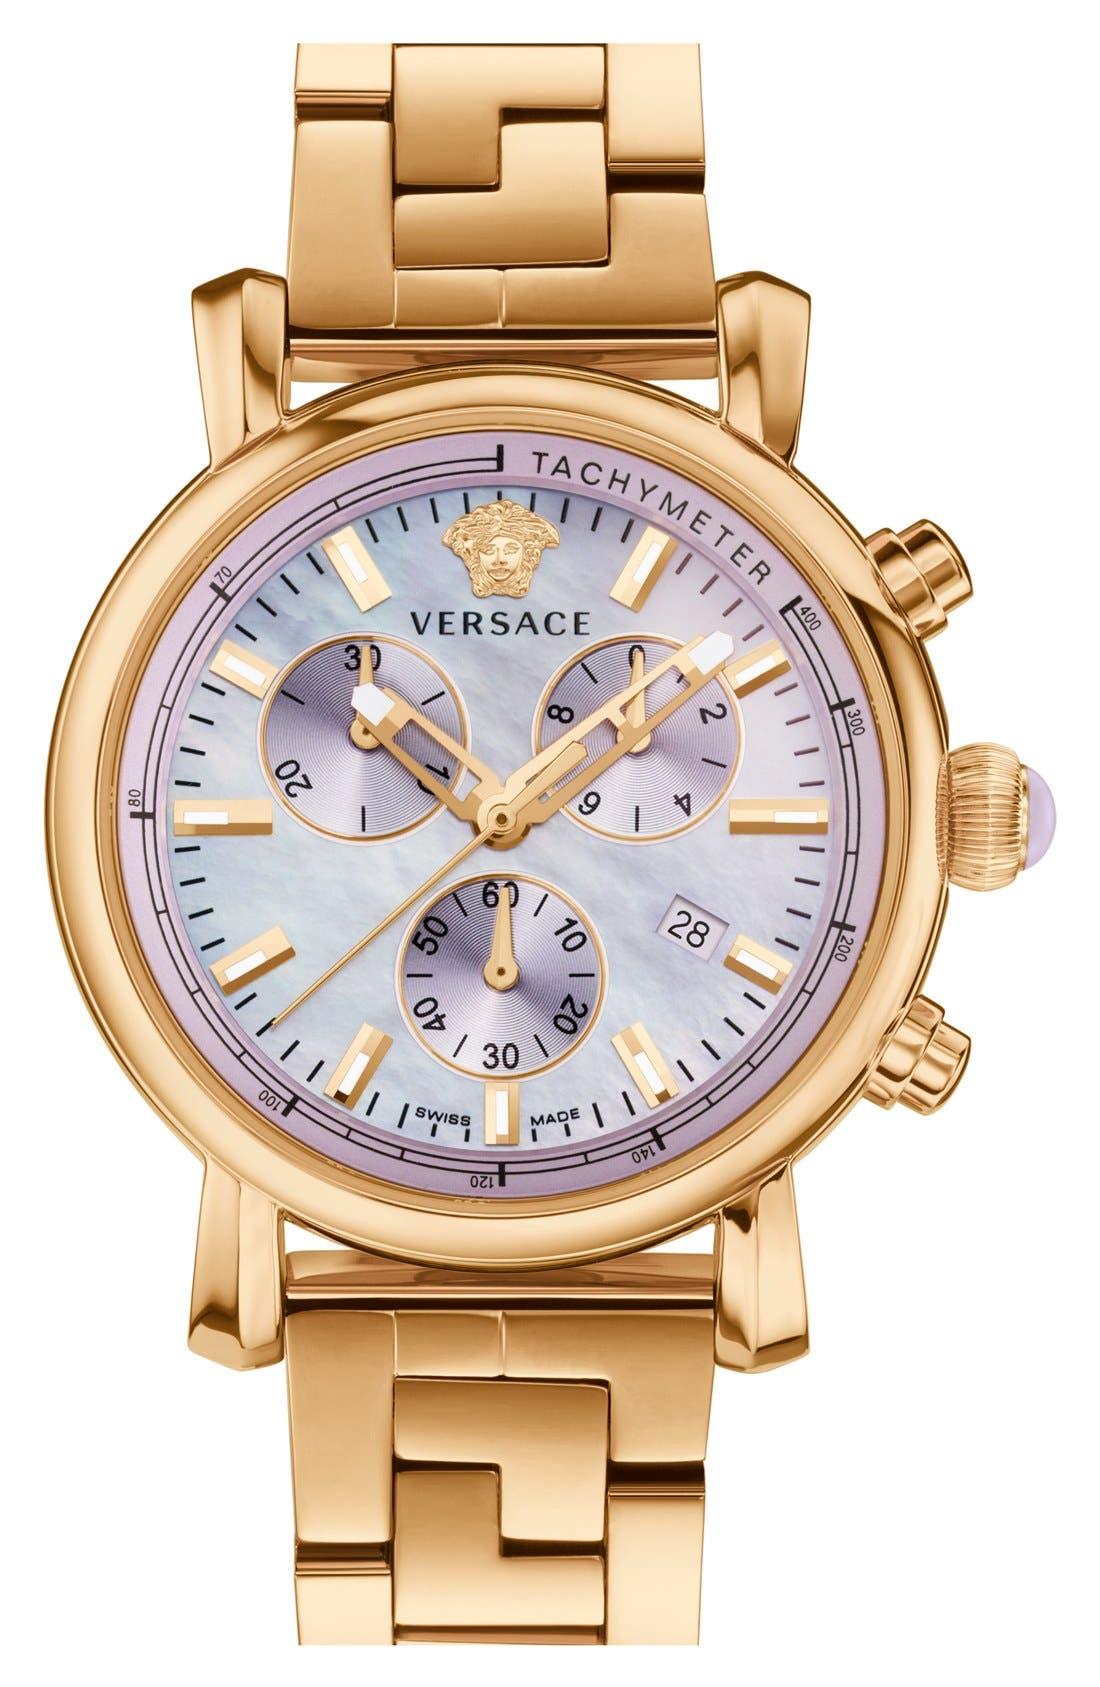 Main Image - Versace 'Day Glam' Chronograph Bracelet Watch, 38mm